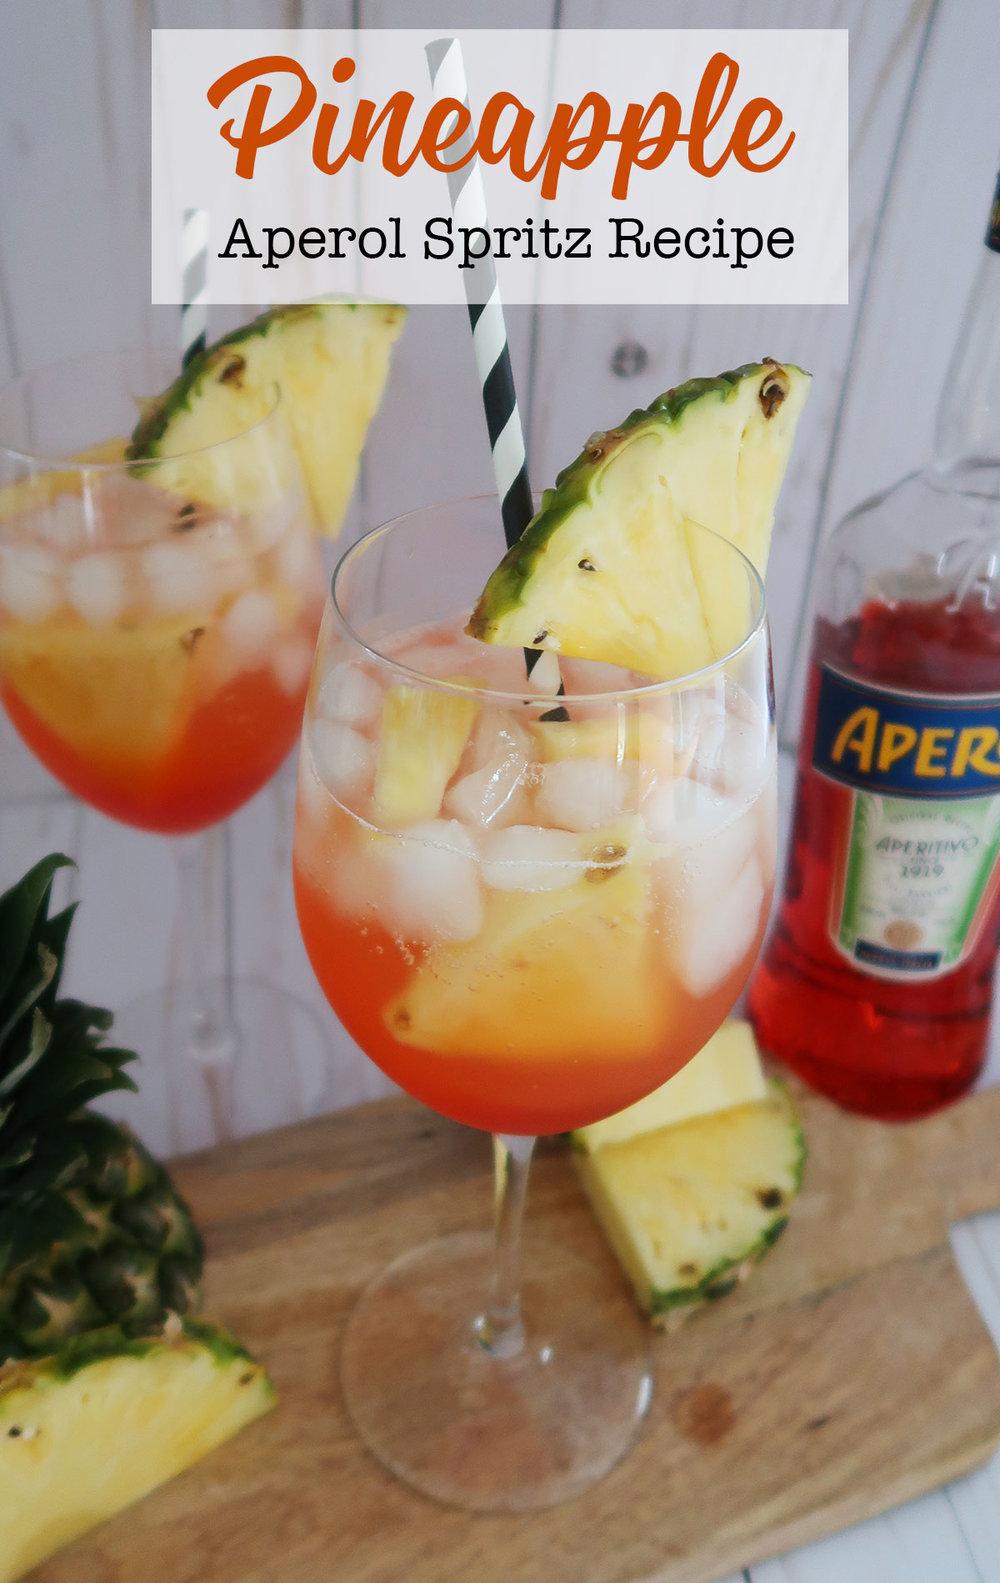 Pineapple aperol spritz recipe